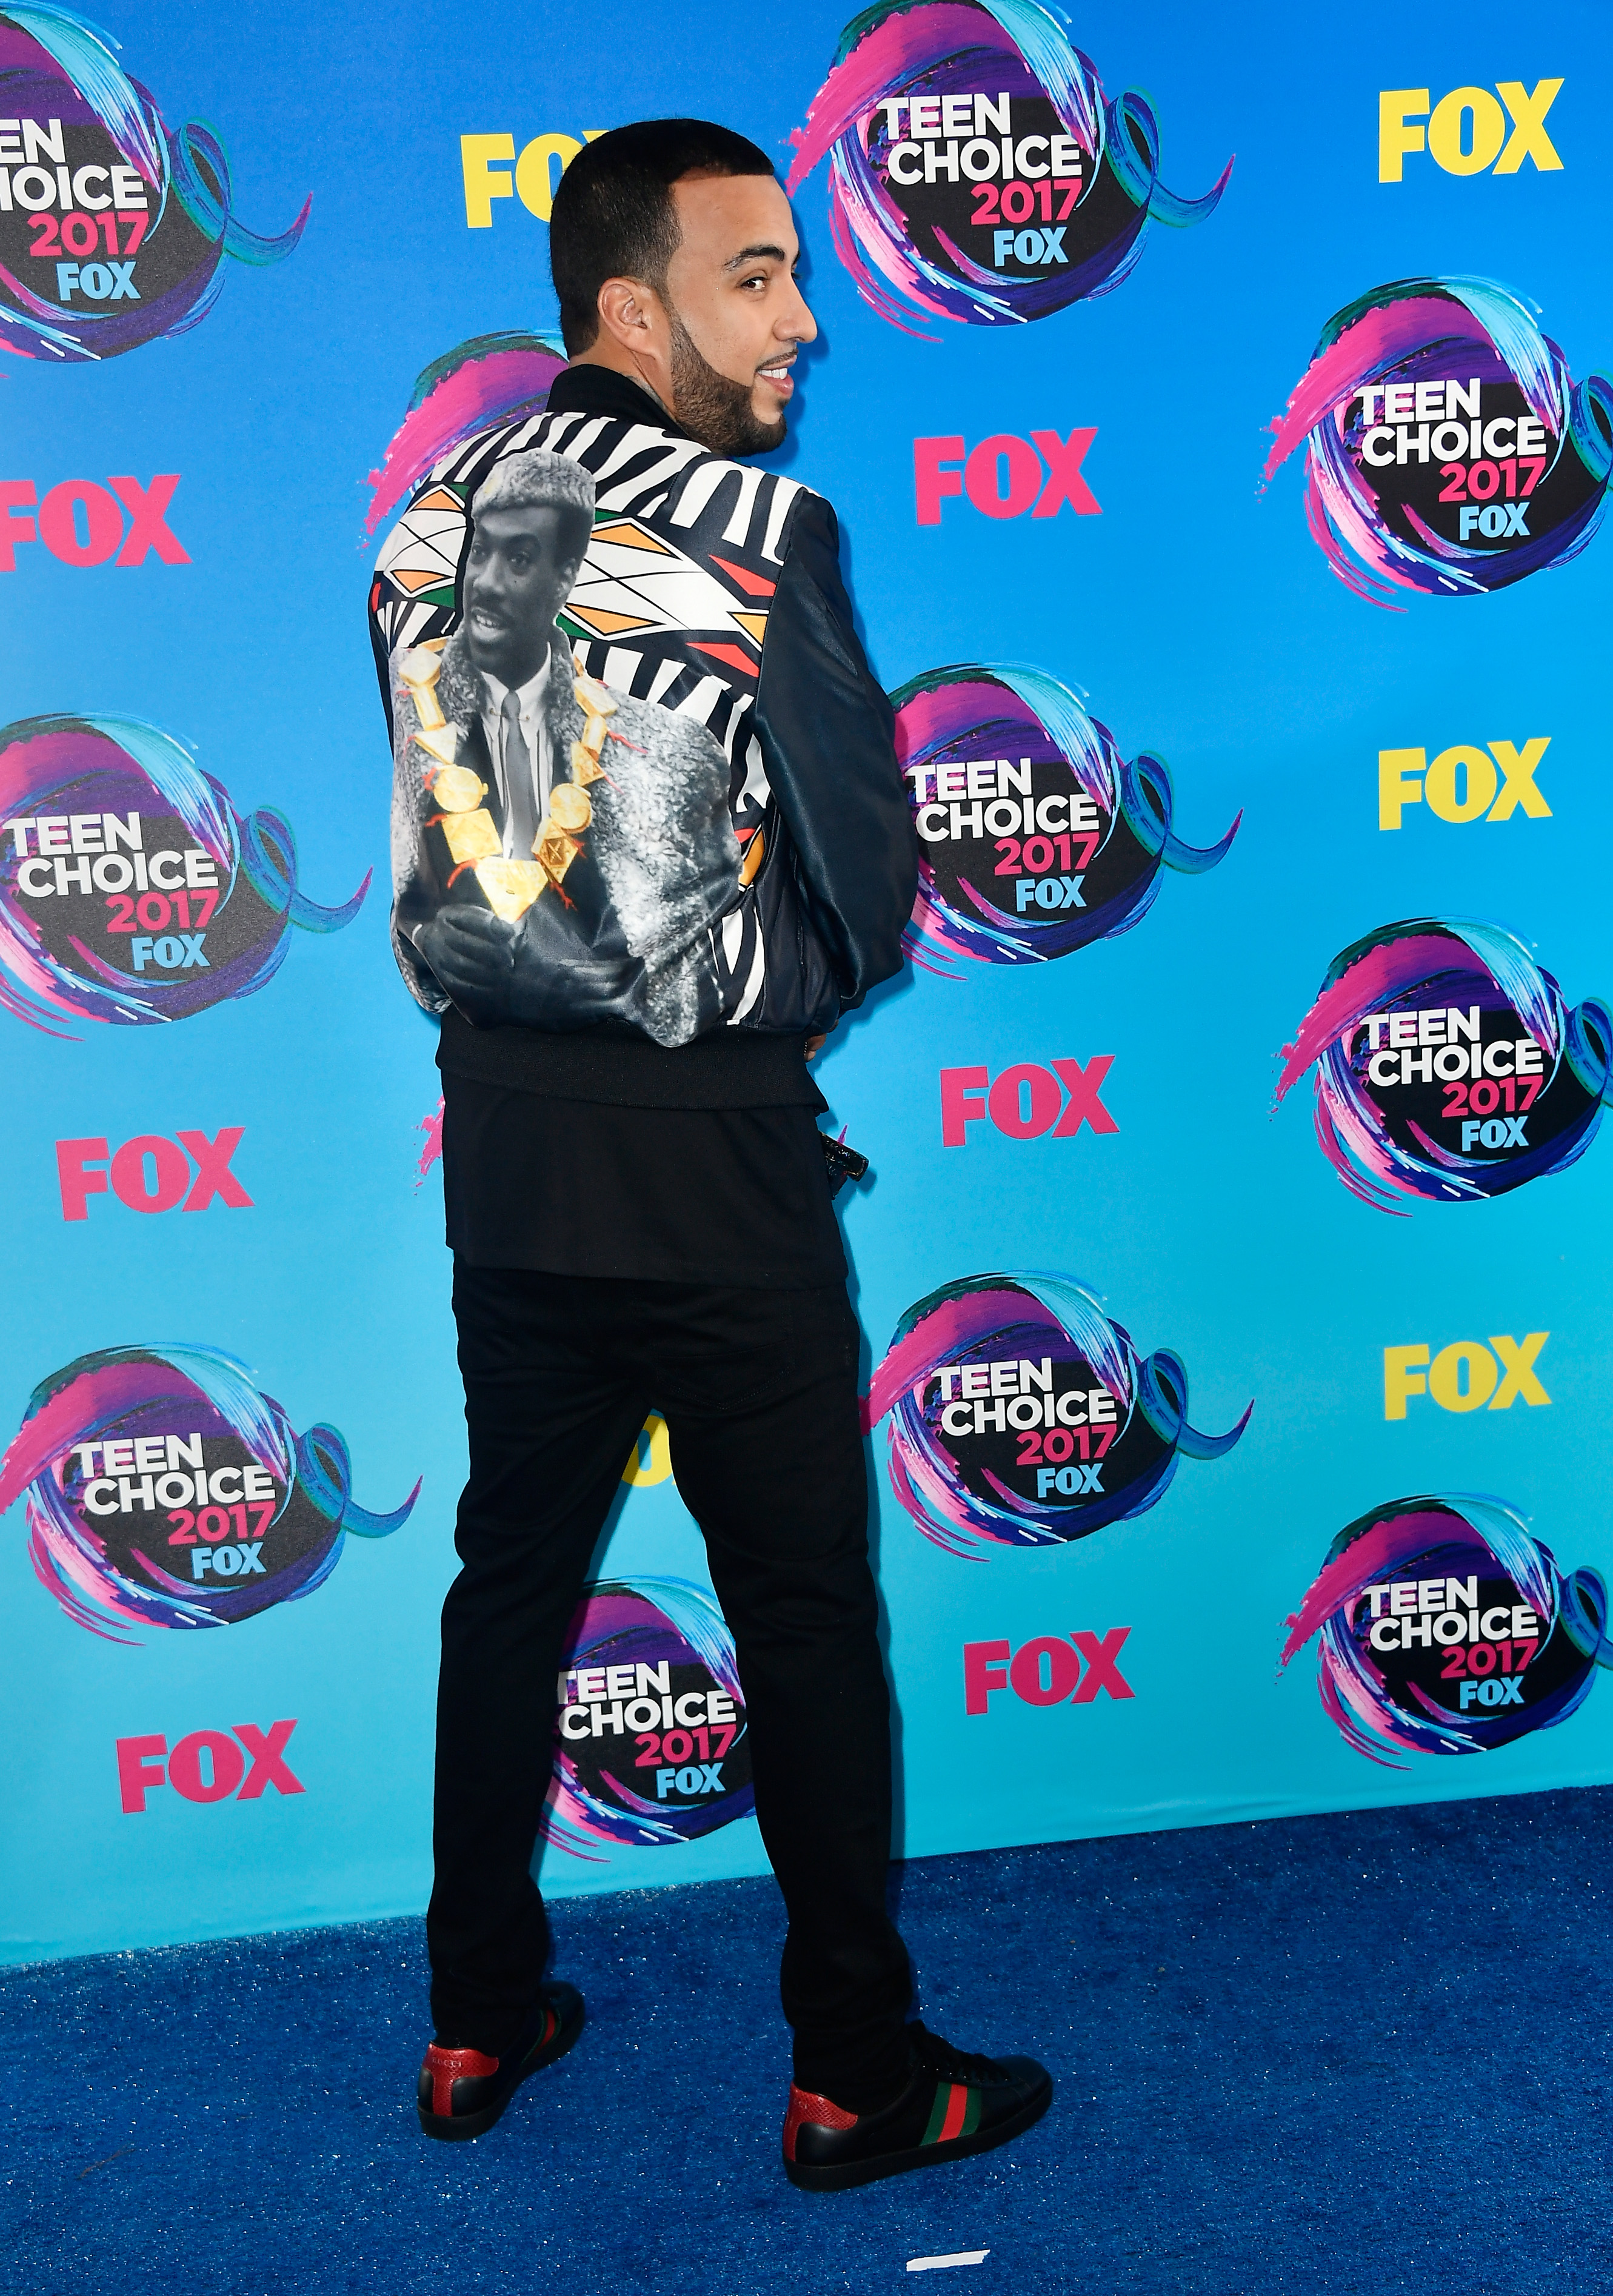 Teen Choice Awards, Teen Choice Awards 2017, Teen Choice Awards 2017 Red Carpet, Teen Choice Awards Best Dressed Photos, Teen Choice Awards 2017 Red Carpet Photos